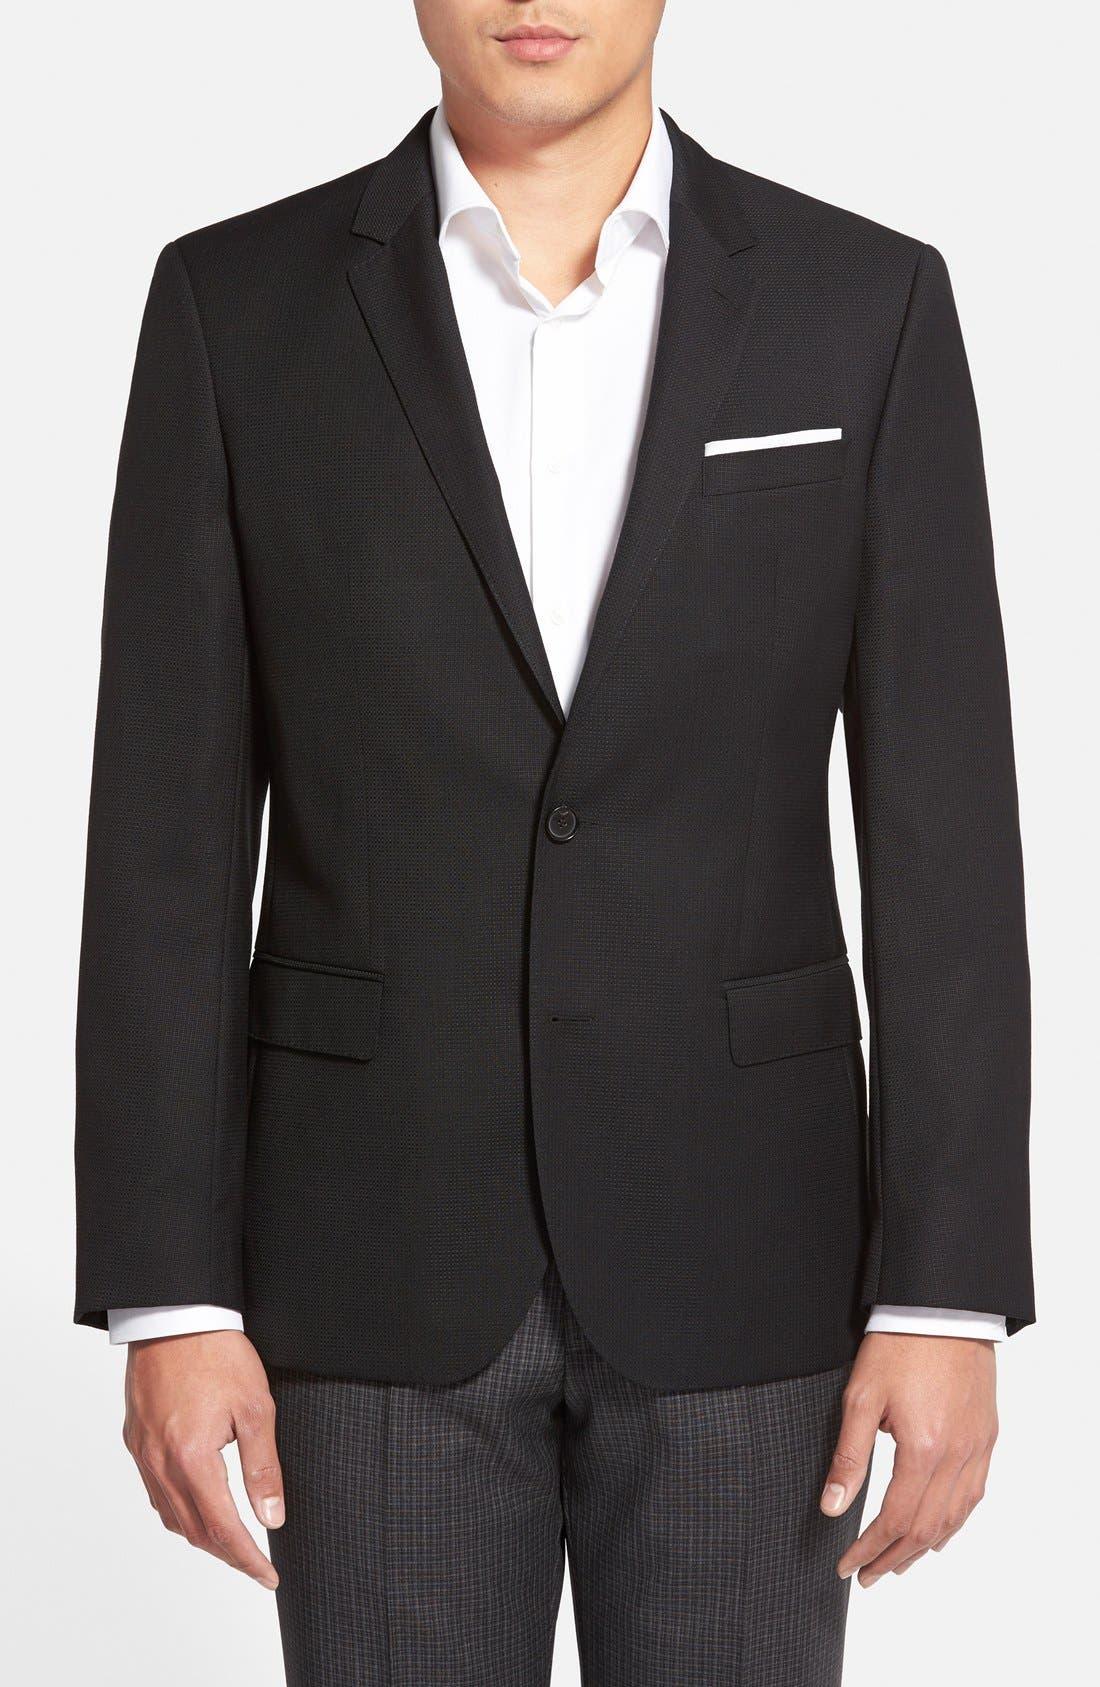 Hutch Trim Fit Wool Blazer,                         Main,                         color, Black